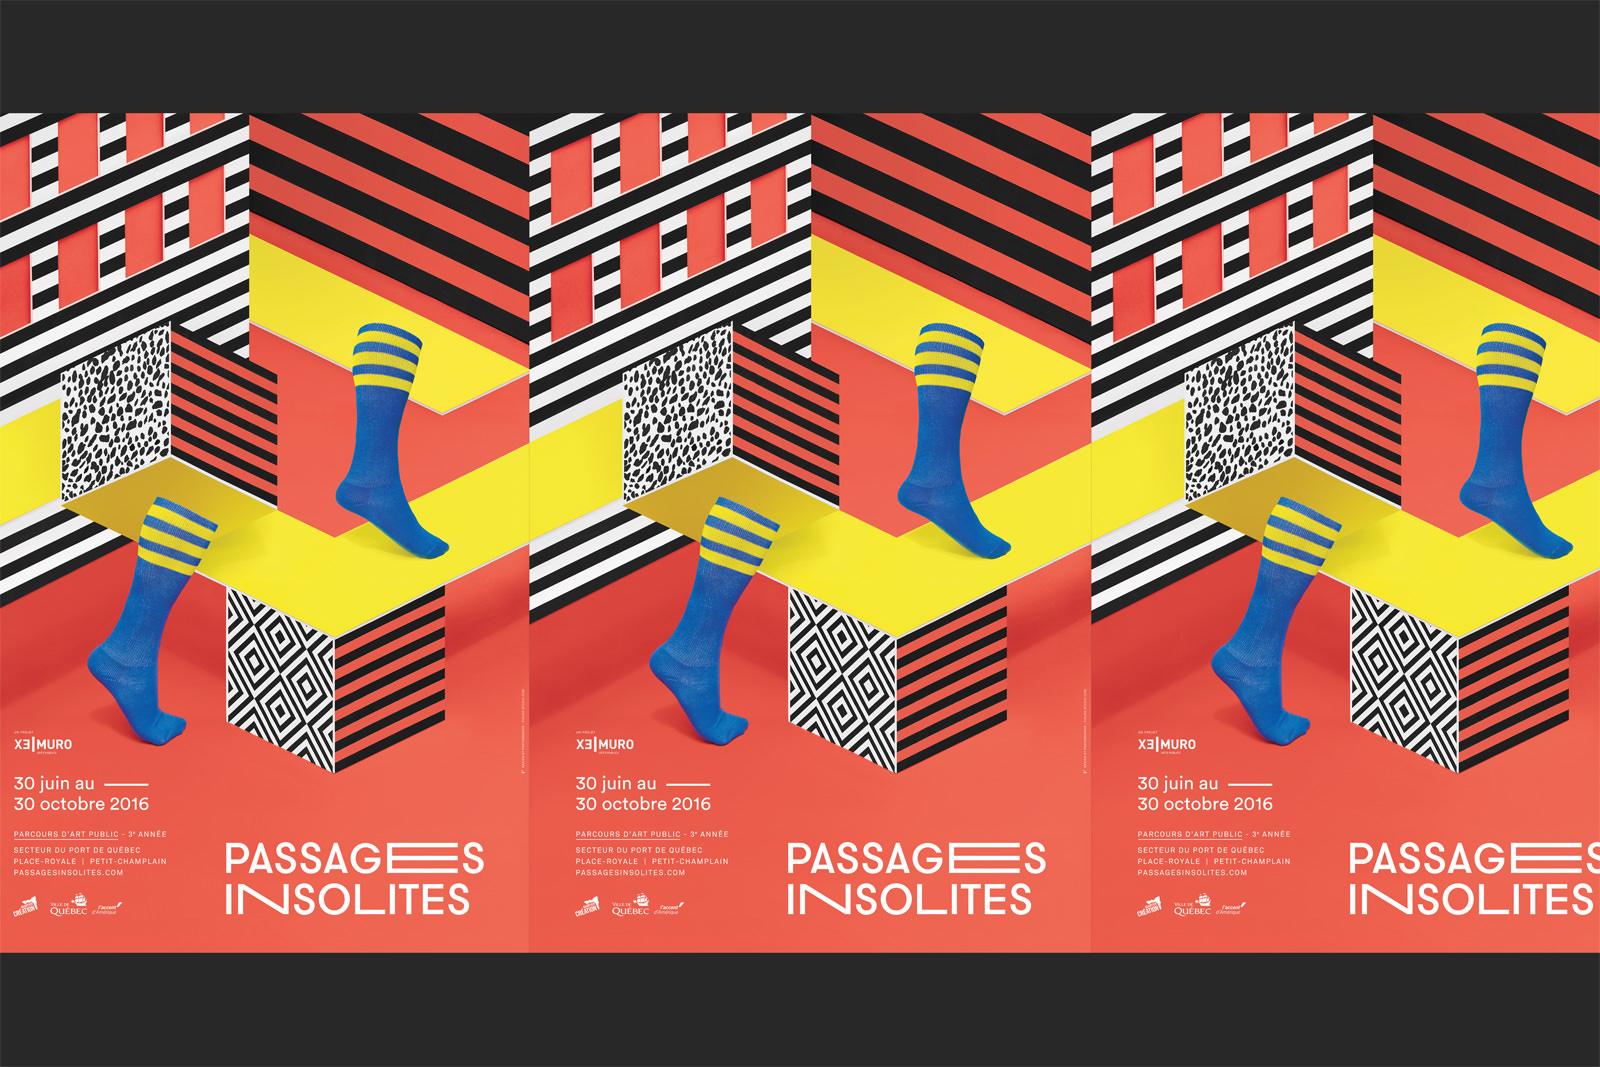 PassagesInsolites-JeremyHall-Figure-ExMuro-7.jpg